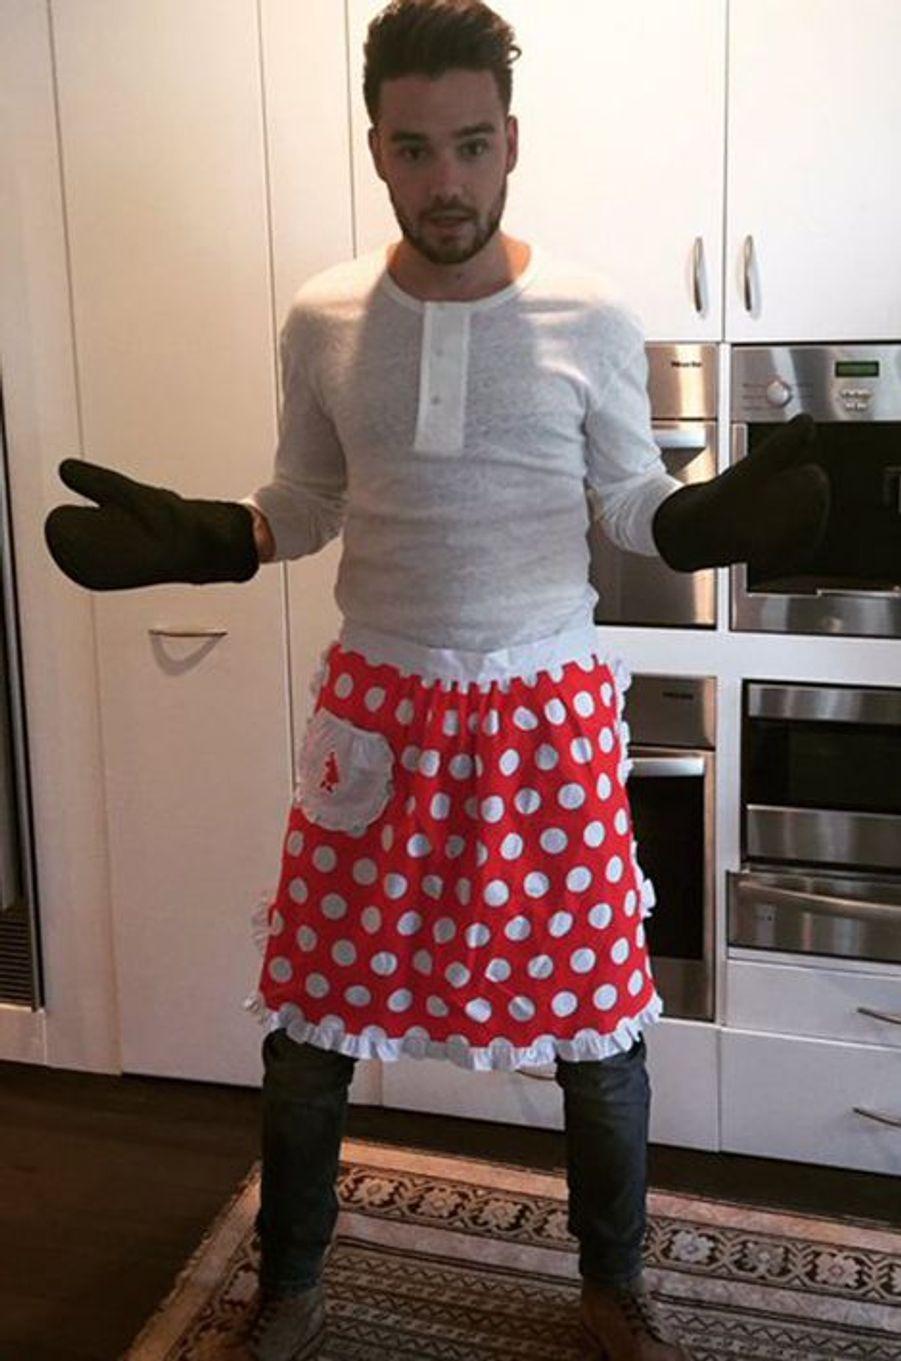 Liam Payne aux fourneaux (One Direction)